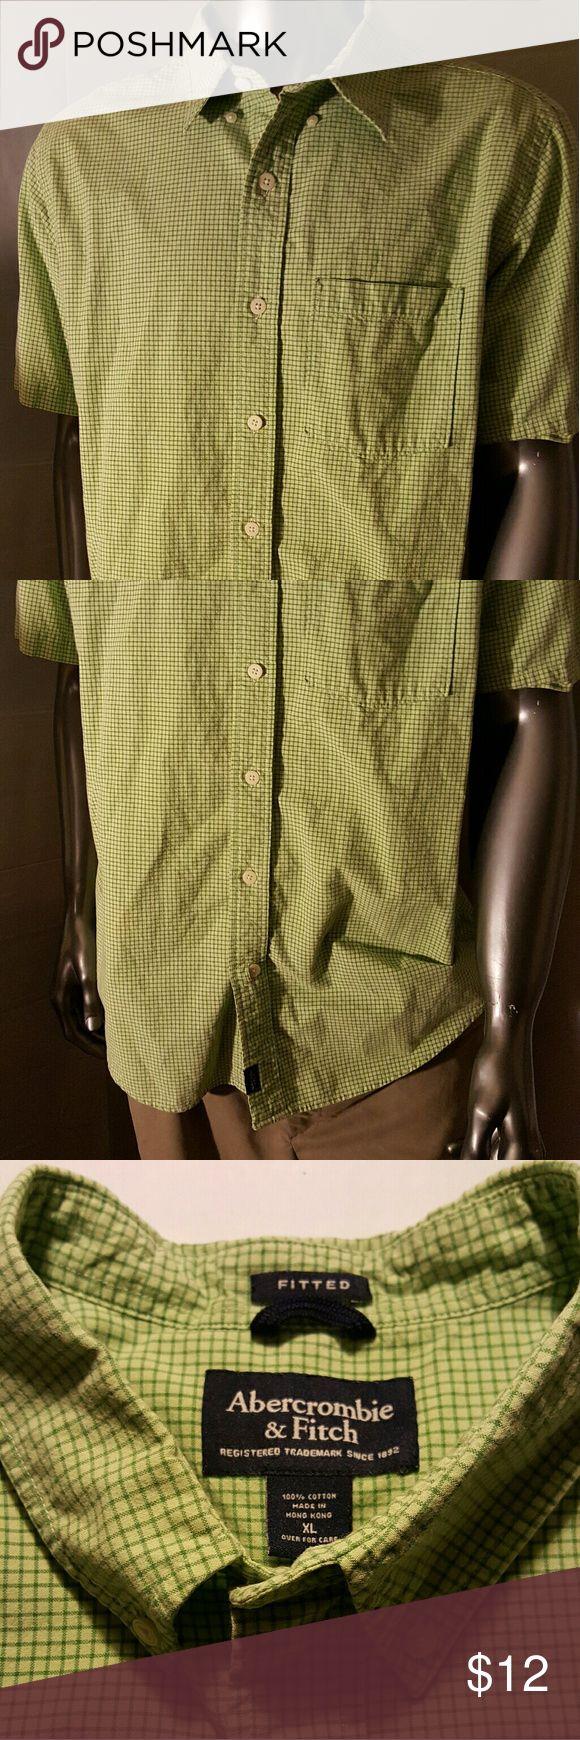 Abercrombie & Fitch Men's  Button  Down  Size XL Abercrombie & Fitch Men's  Button  Down  Size XL Abercrombie & Fitch Shirts Casual Button Down Shirts